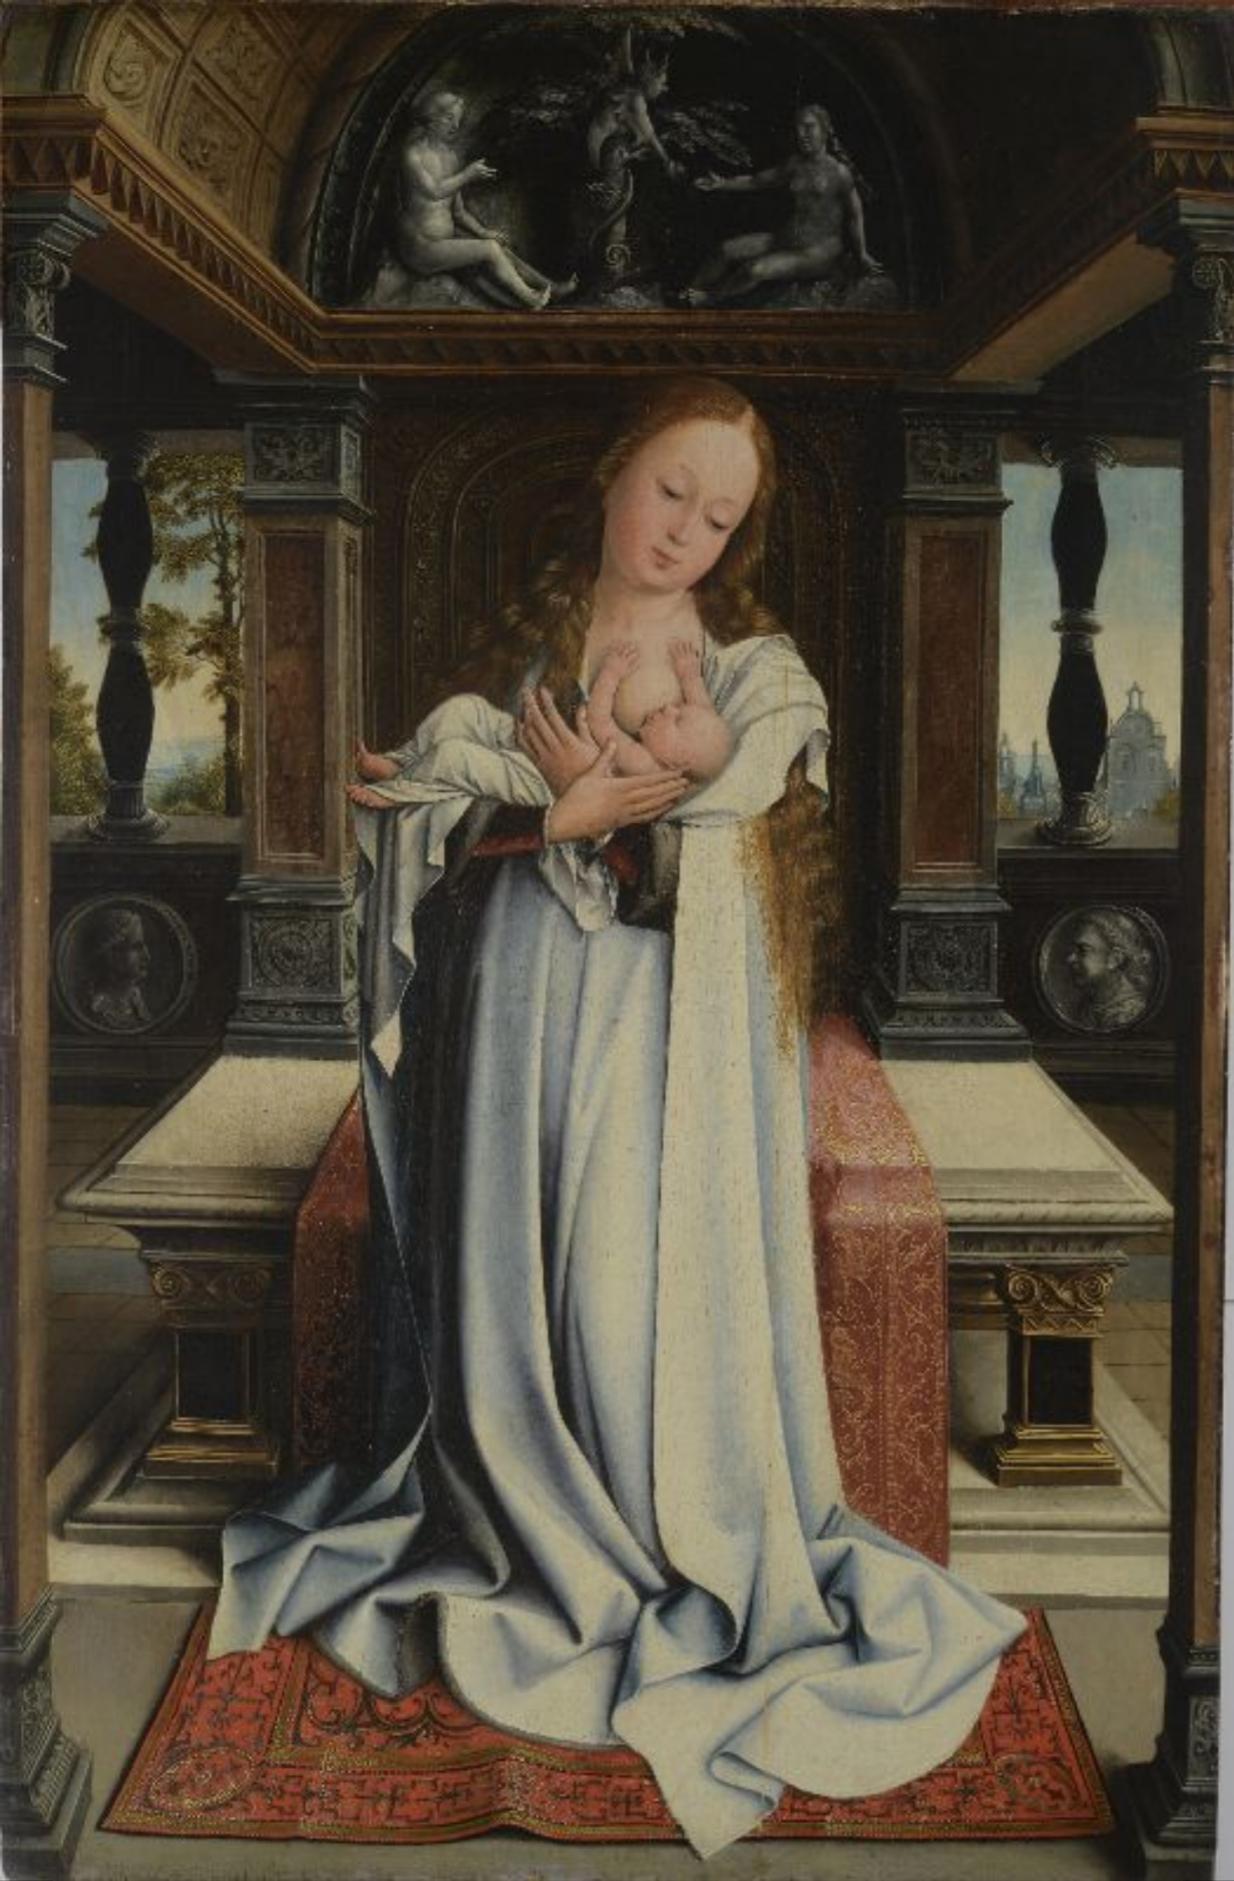 https://i1.wp.com/upload.wikimedia.org/wikipedia/commons/8/8b/Bernard_van_Orley_-_Virgin_and_Child_-_WGA16692.jpg